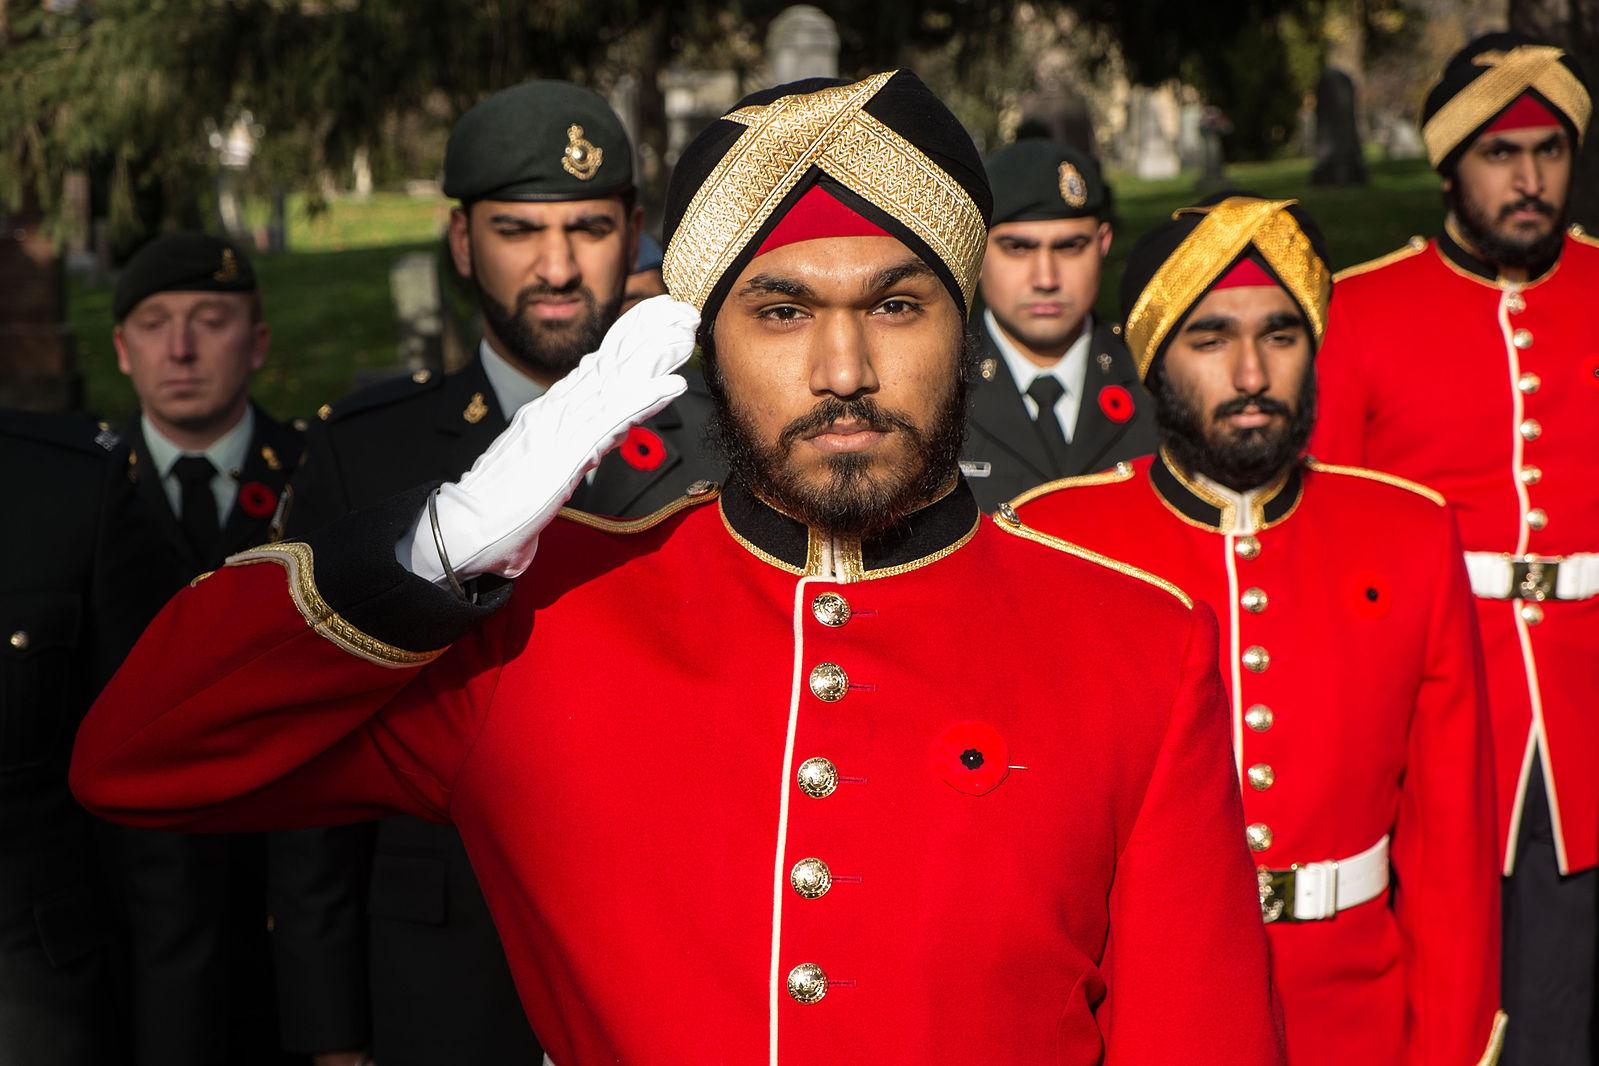 OCdt._Sarabjot_Anand,_OCdt._Sarbjeet_Nijher_and_OCdt._Saajandeep_Sarai_represent_Royal_Military_College_of_Canada_at_Sikh_Remembrance_Day_2013.jpg